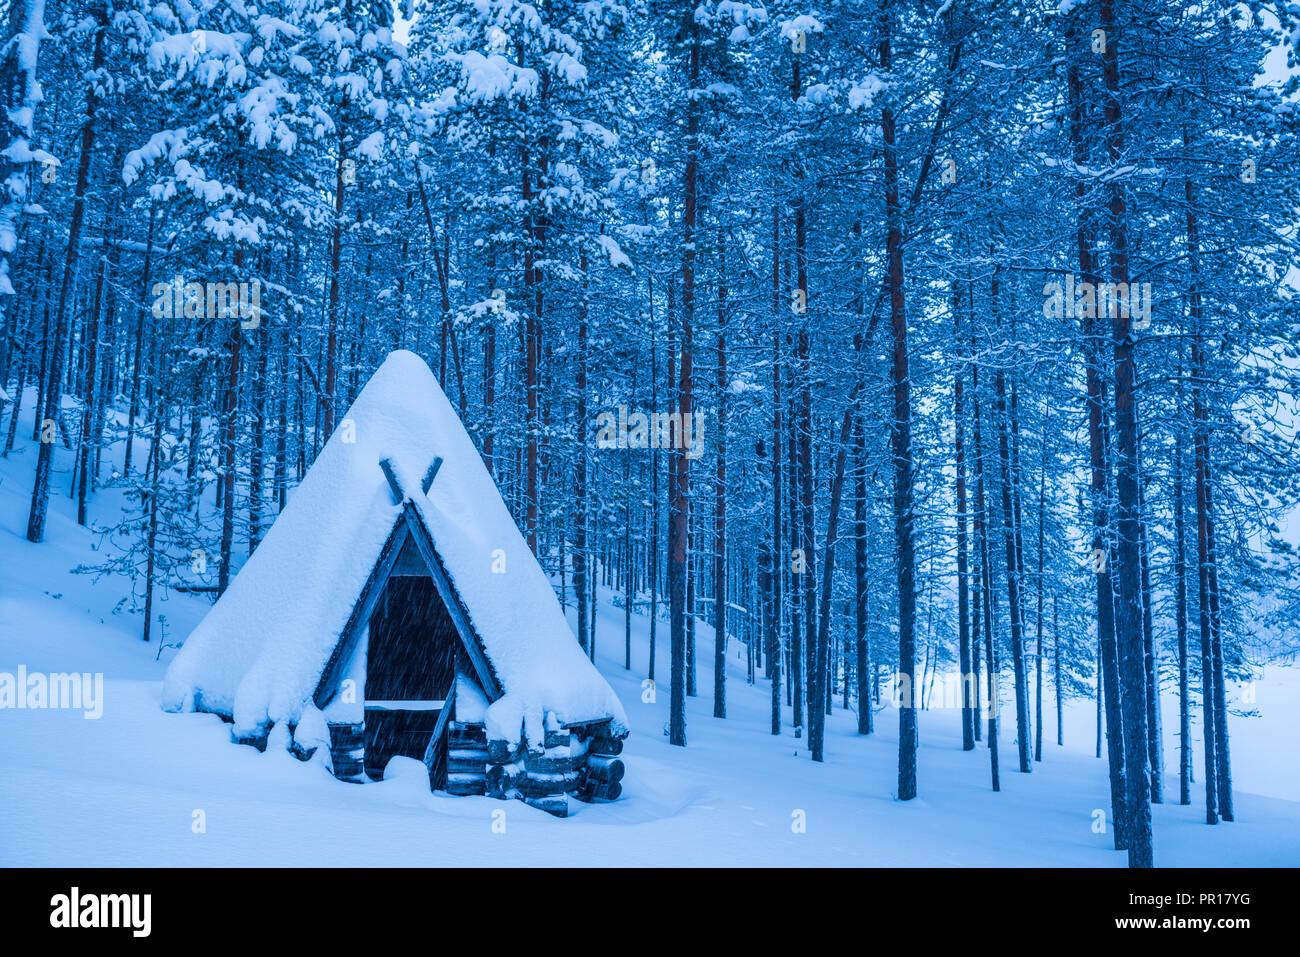 Kota, a traditional Lapland shelter, Pallas-Yllastunturi National Park, Lapland, Finland, Europe - Stock Image